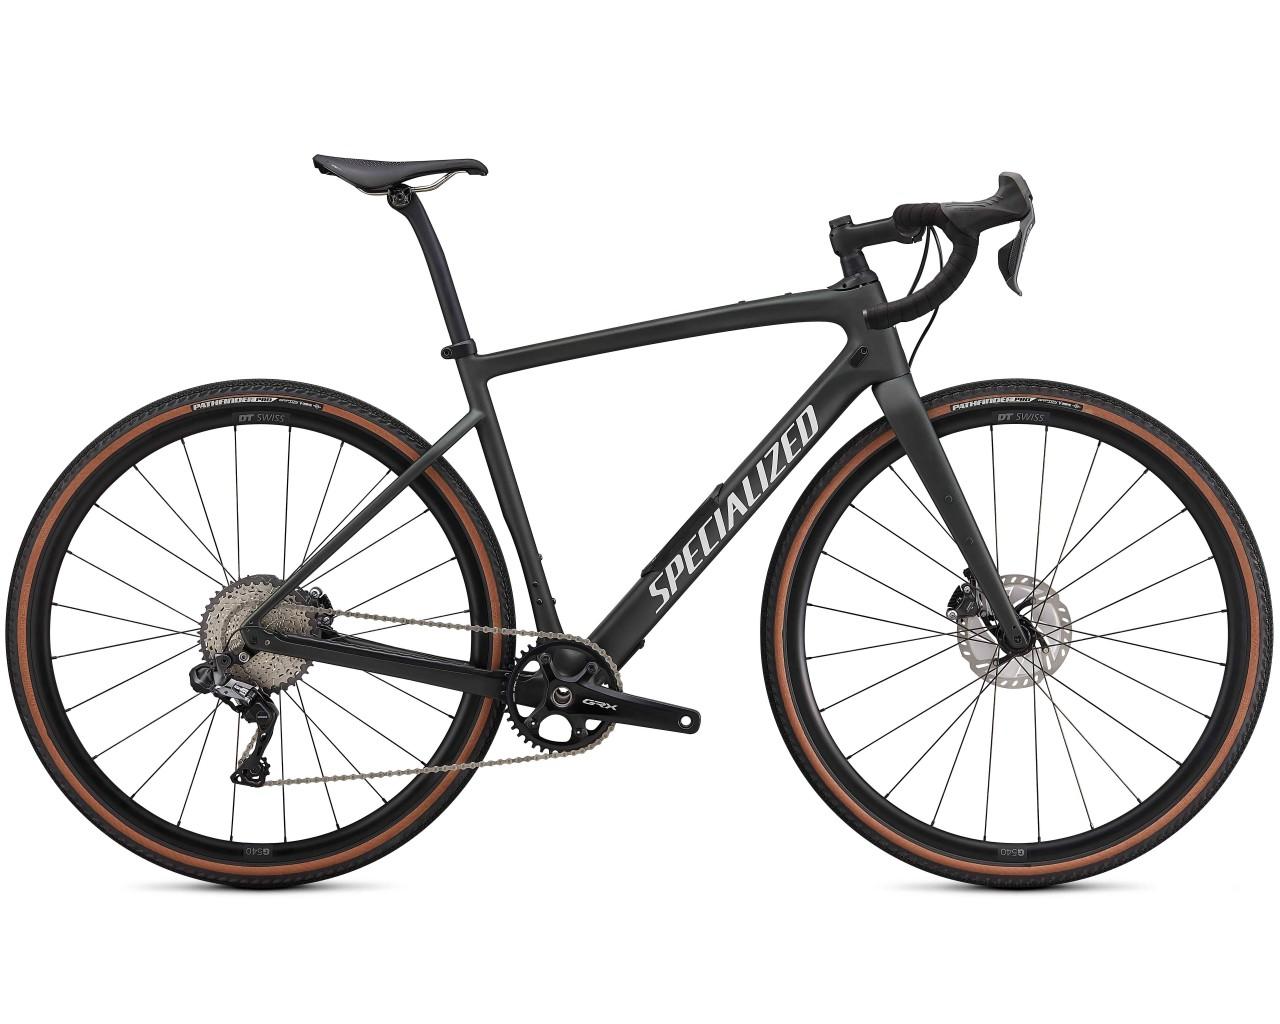 Specialized Diverge Expert Carbon - Gravel Bike 2021 | satin oak green metallic-gloss white-chrome-c